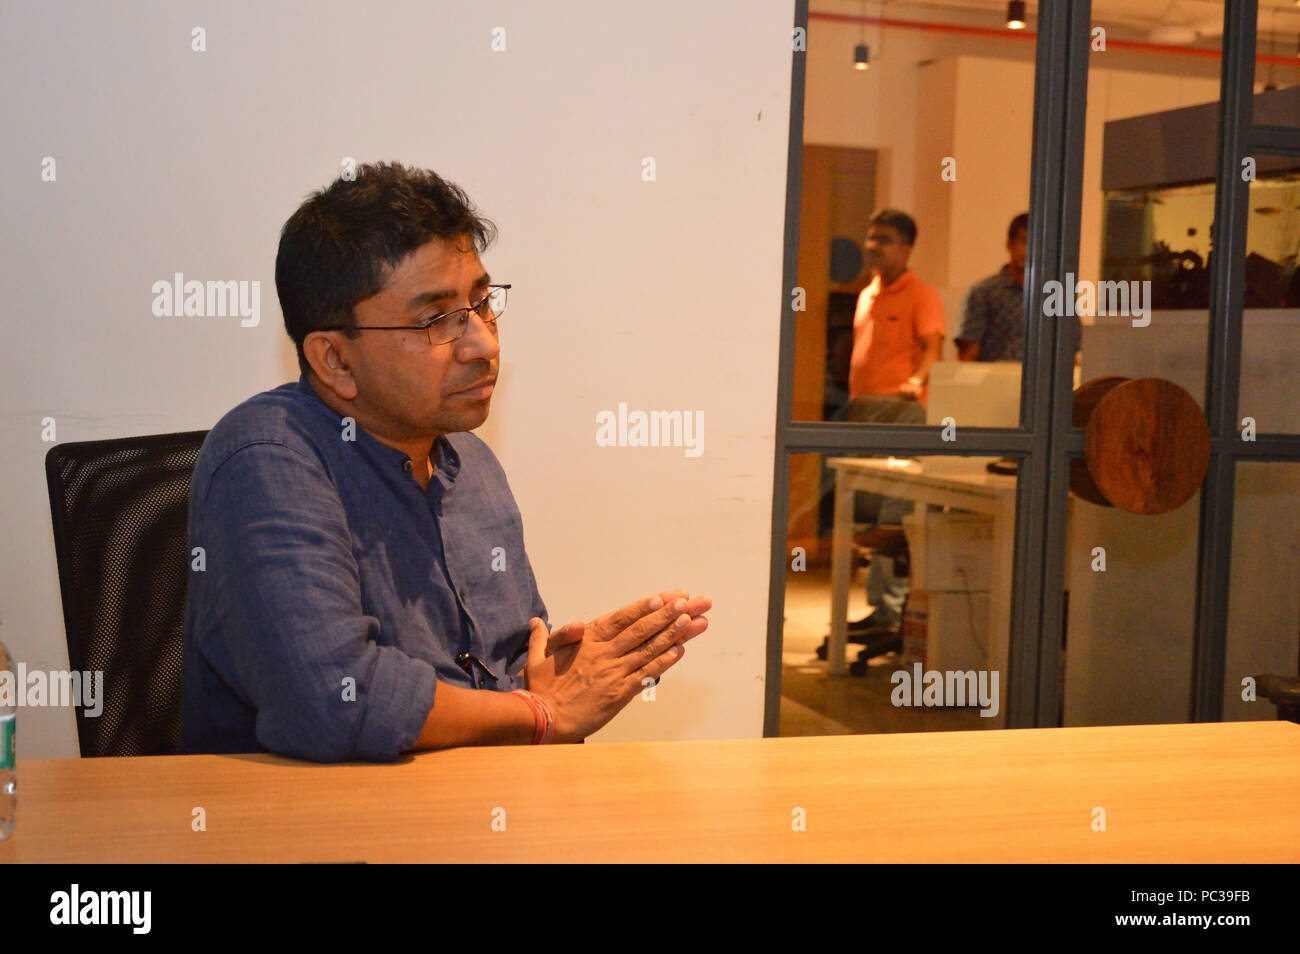 abin chaudhuri born 1975 indian architect and designer